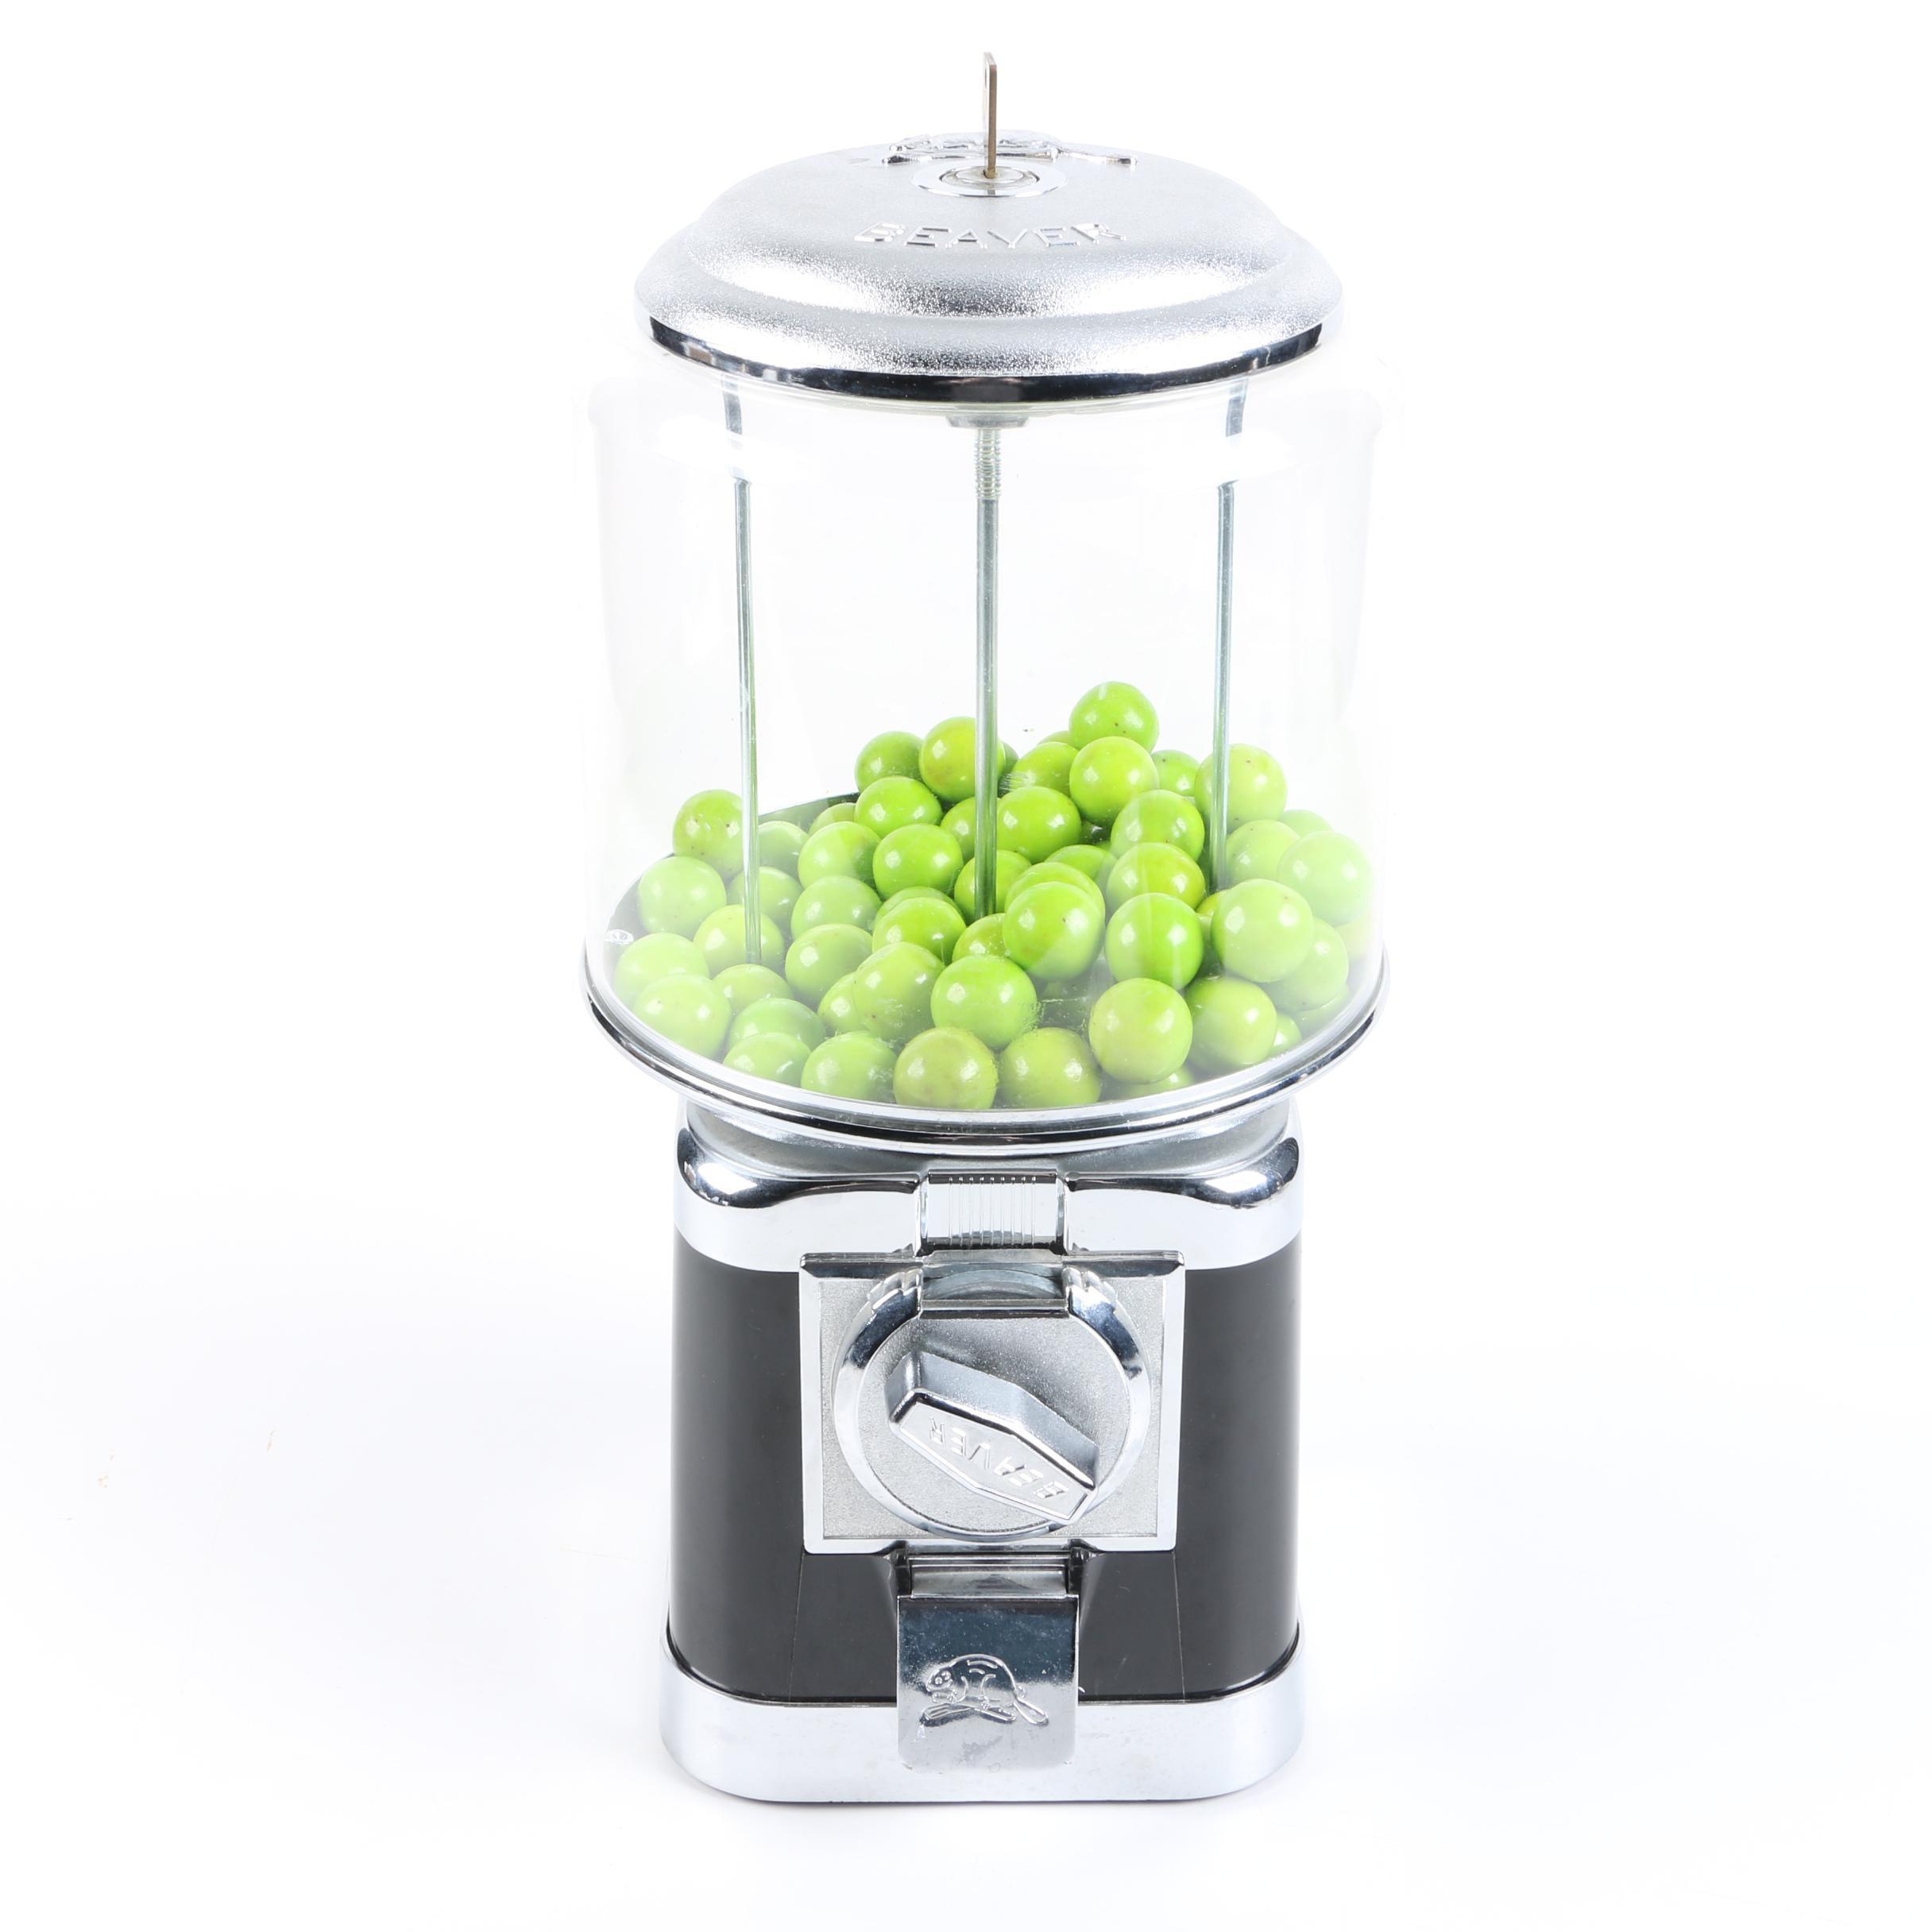 Beaver Gum Ball Machine